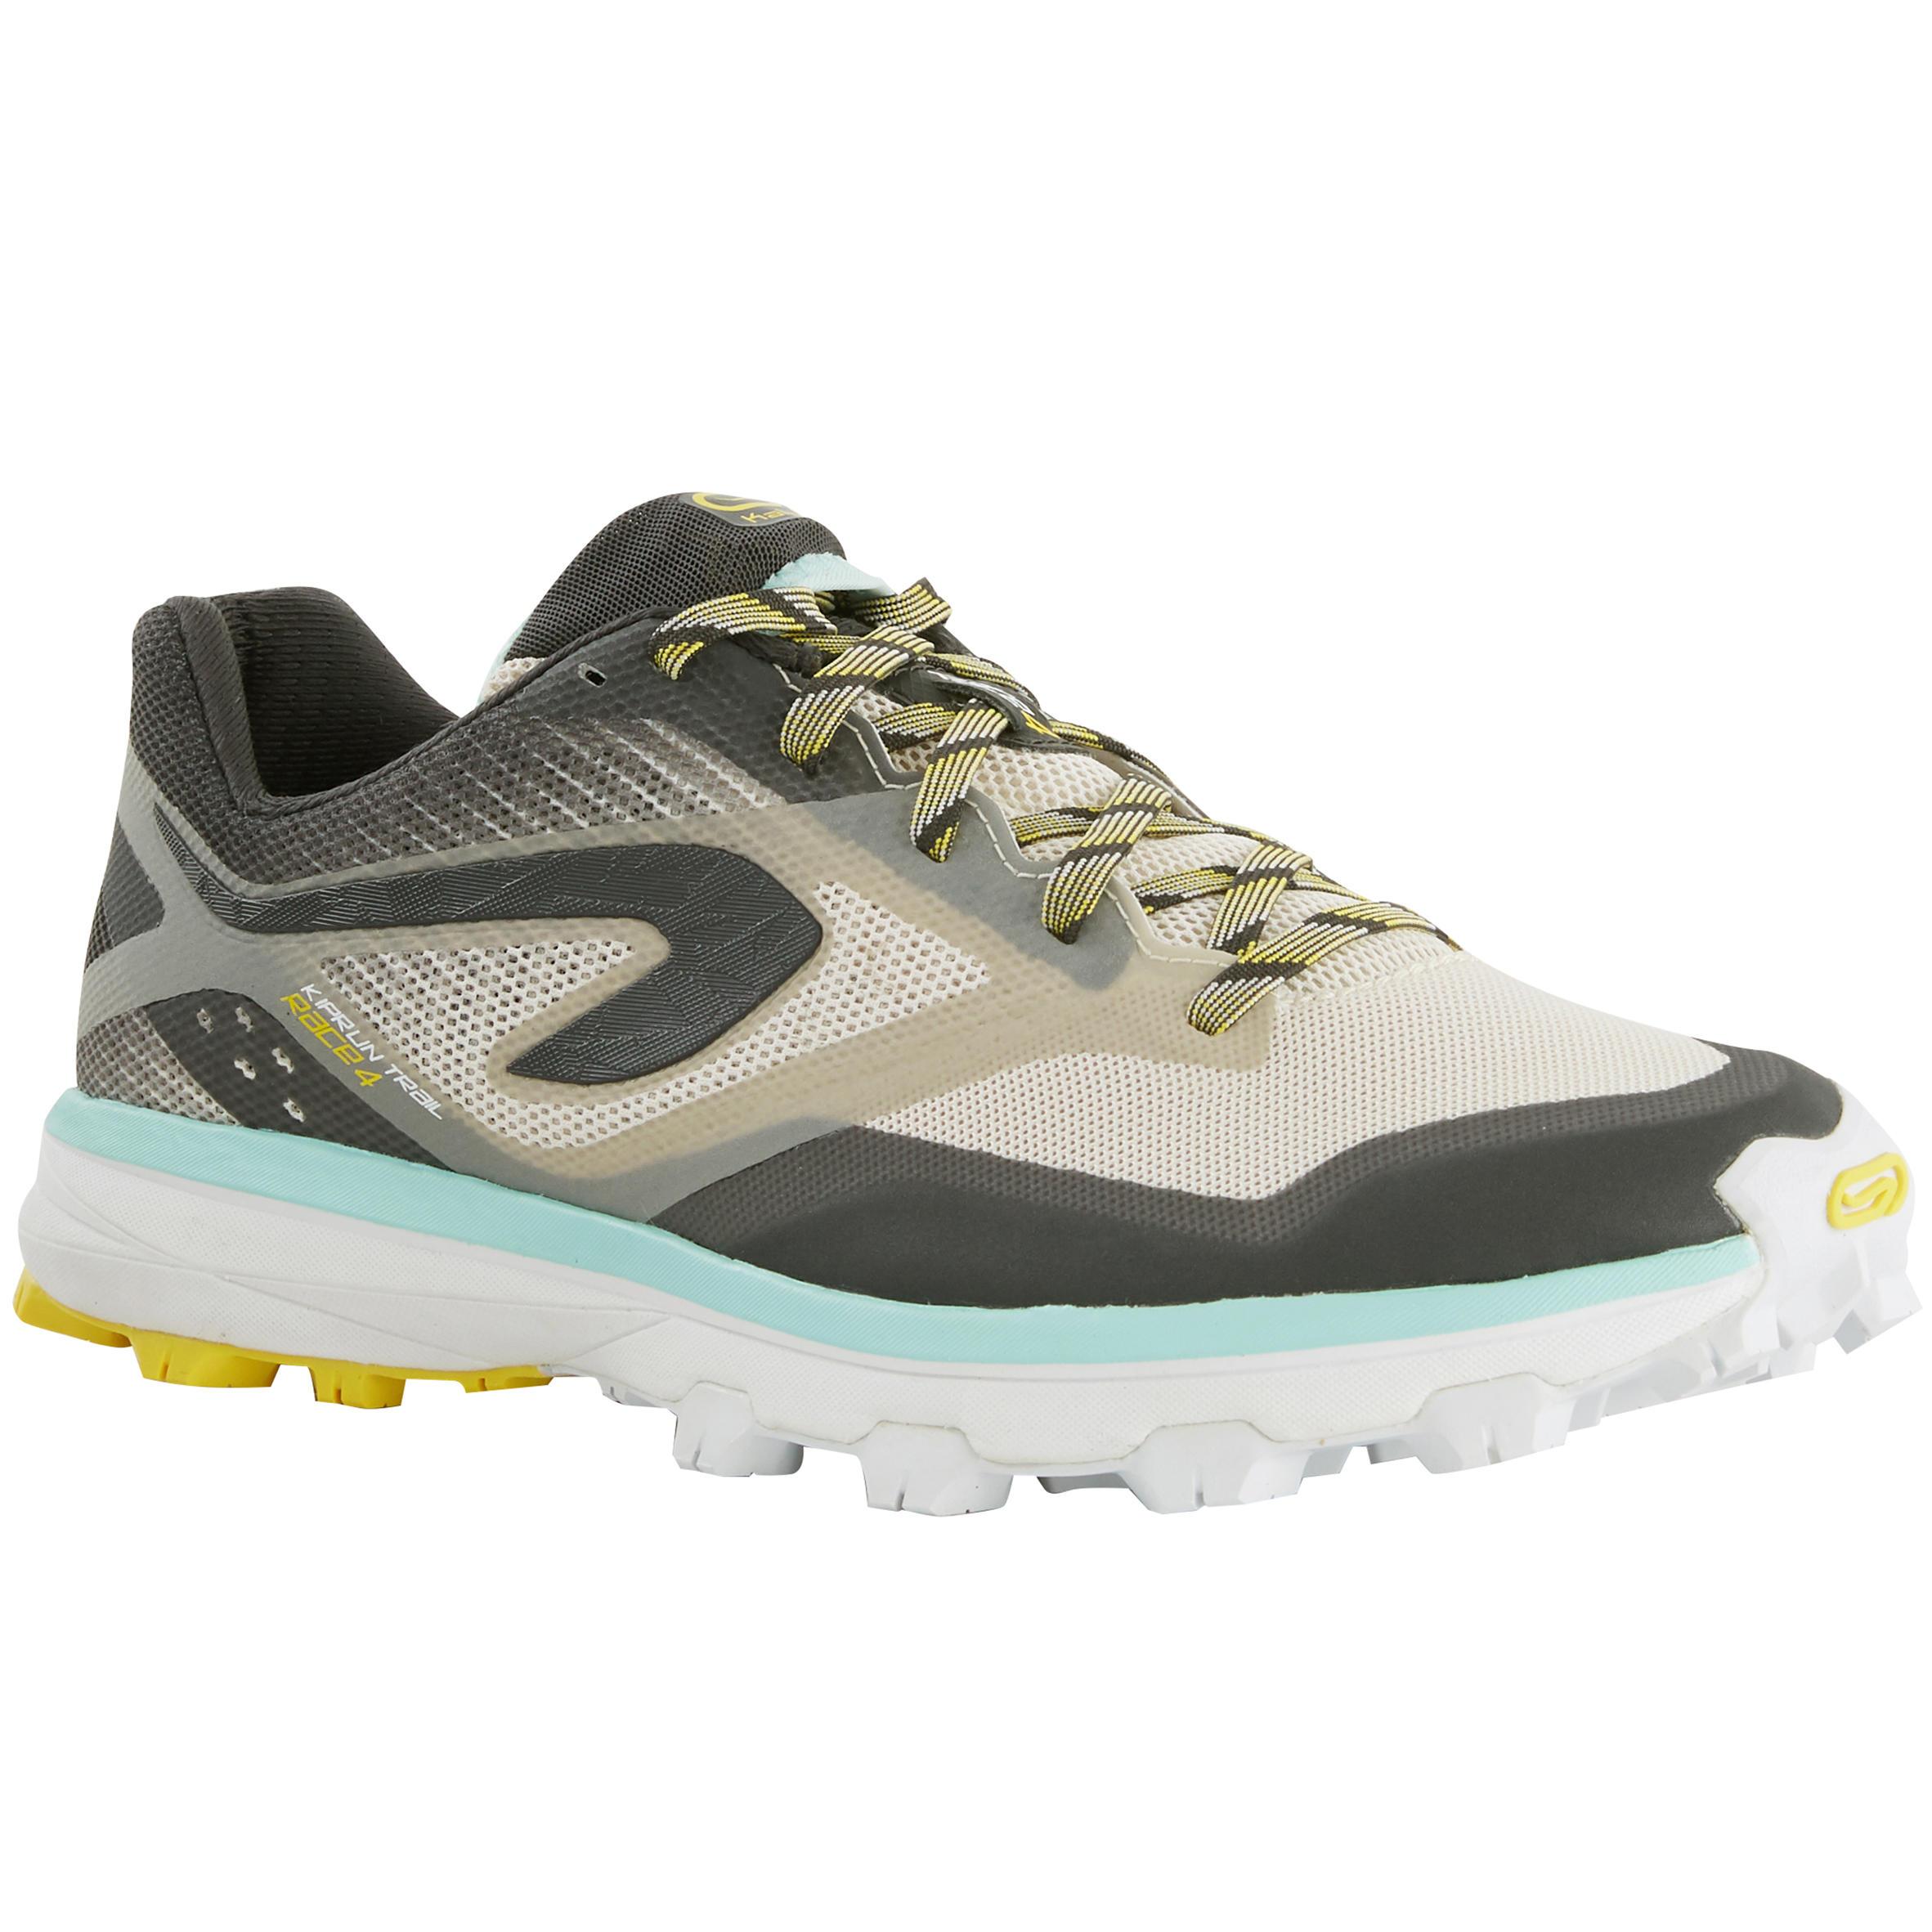 Kalenji Trailschoenen voor dames Kiprun Race 4 grijs geel